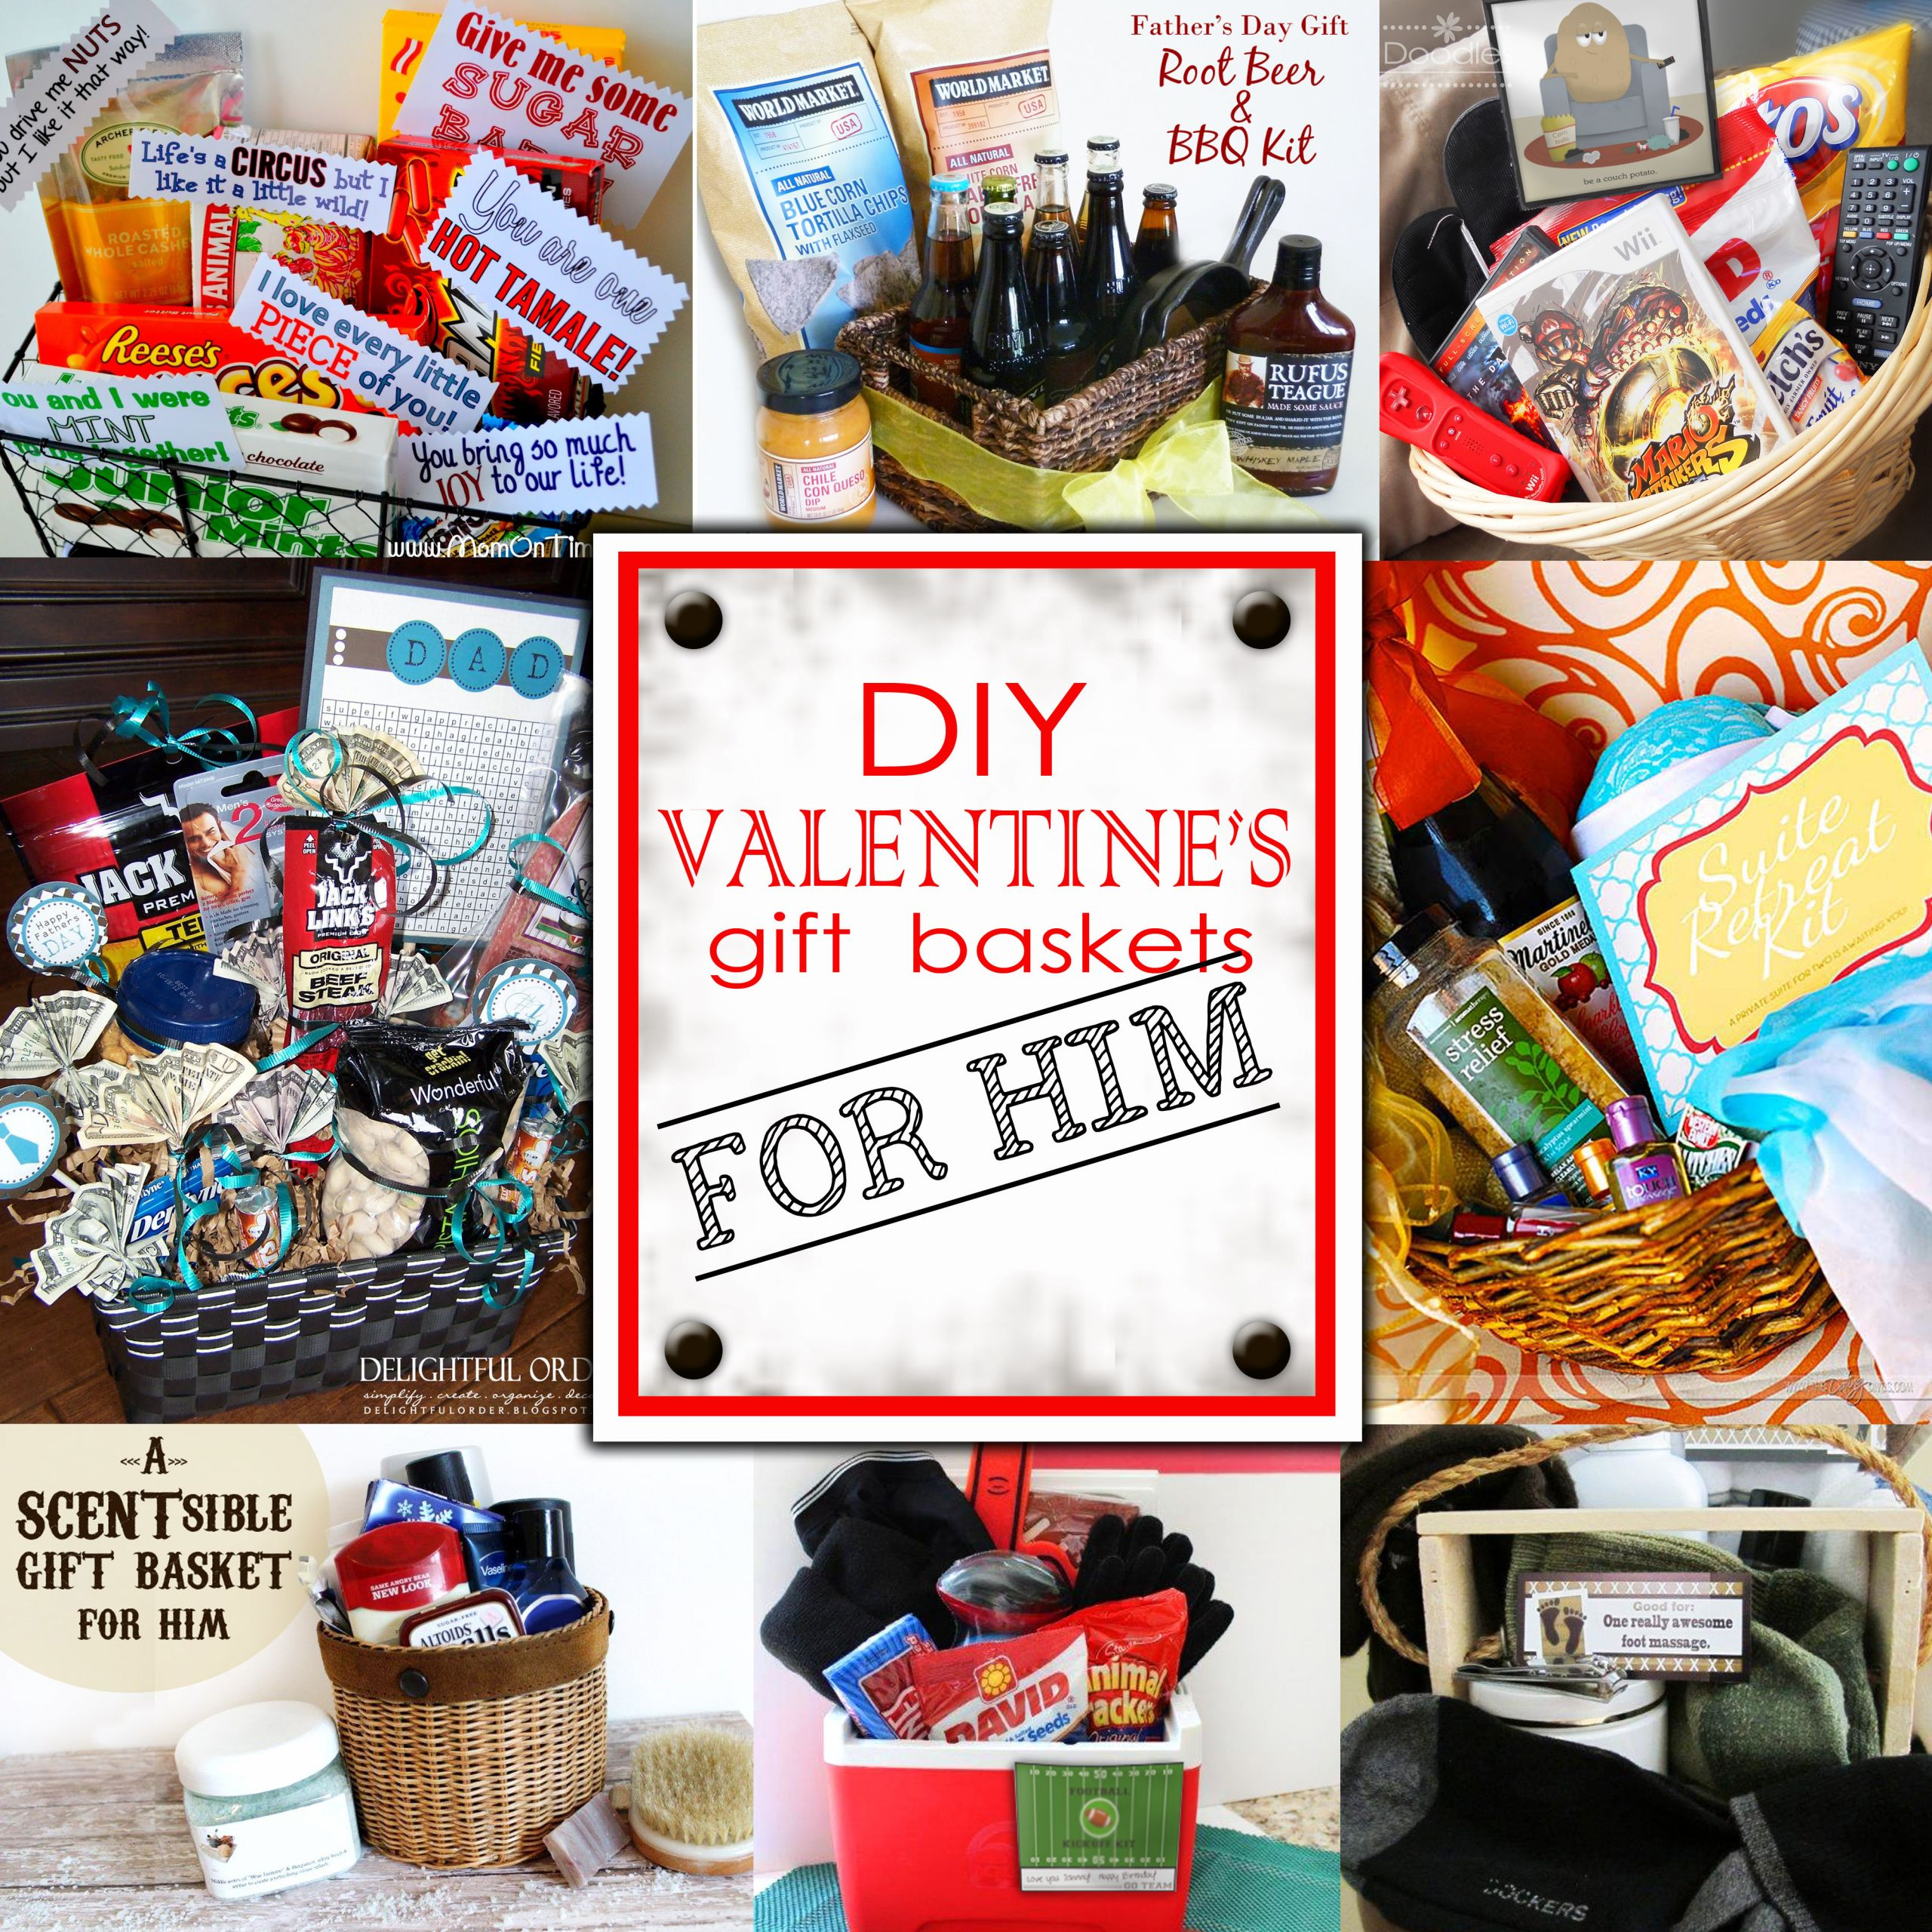 Valentines Day Gifts For Him DIY  DIY Valentine s Day Gift Baskets For Him Darling Doodles